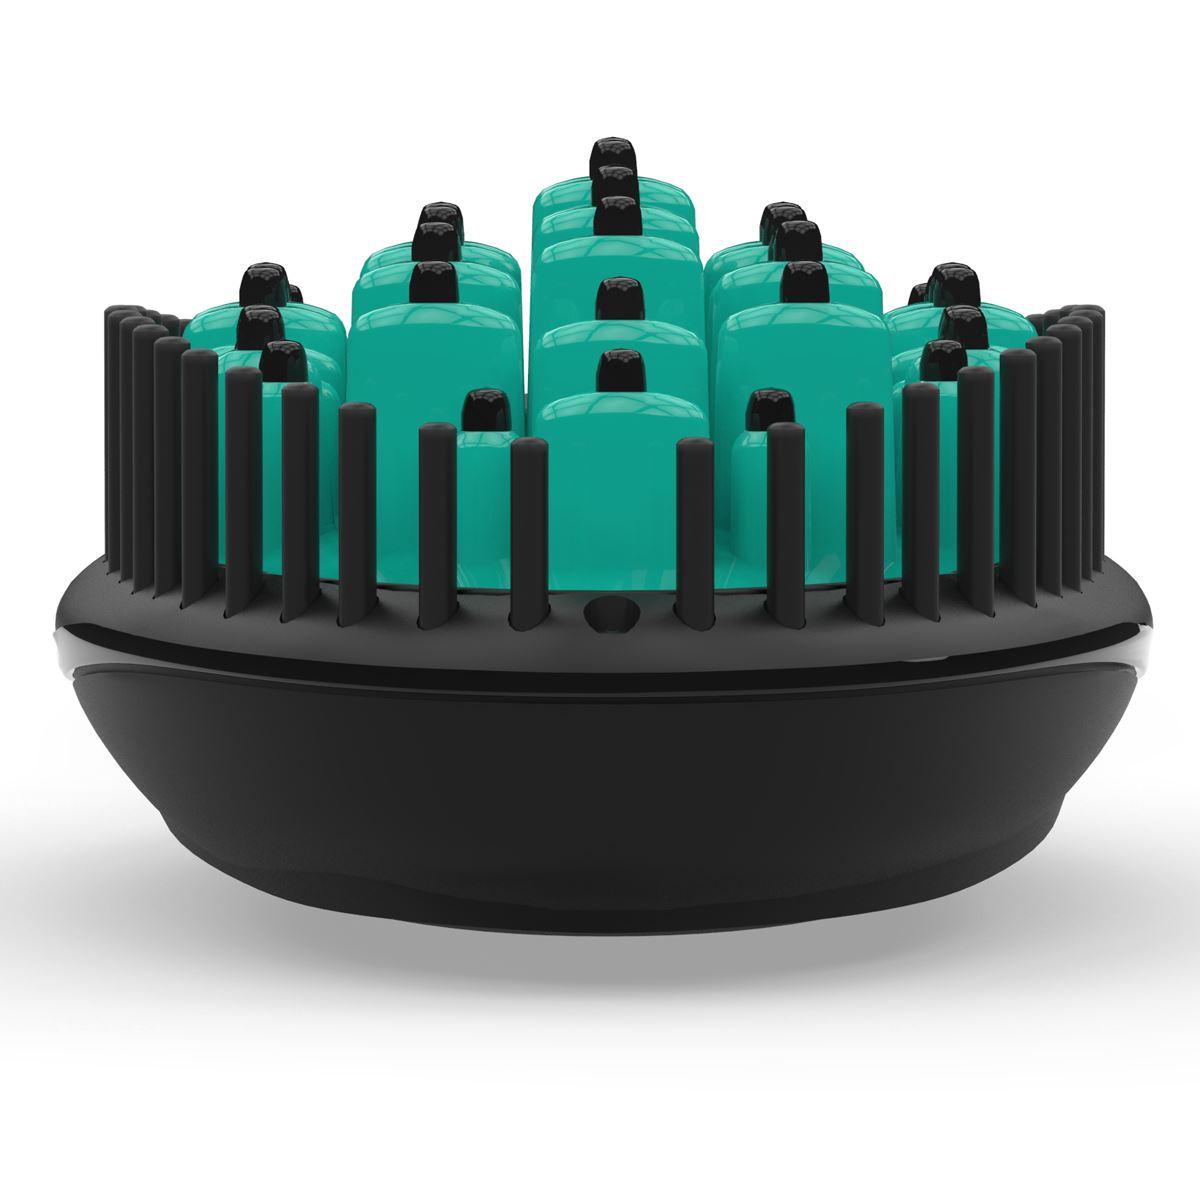 Cepillo eléctrico silker  - Sanborns